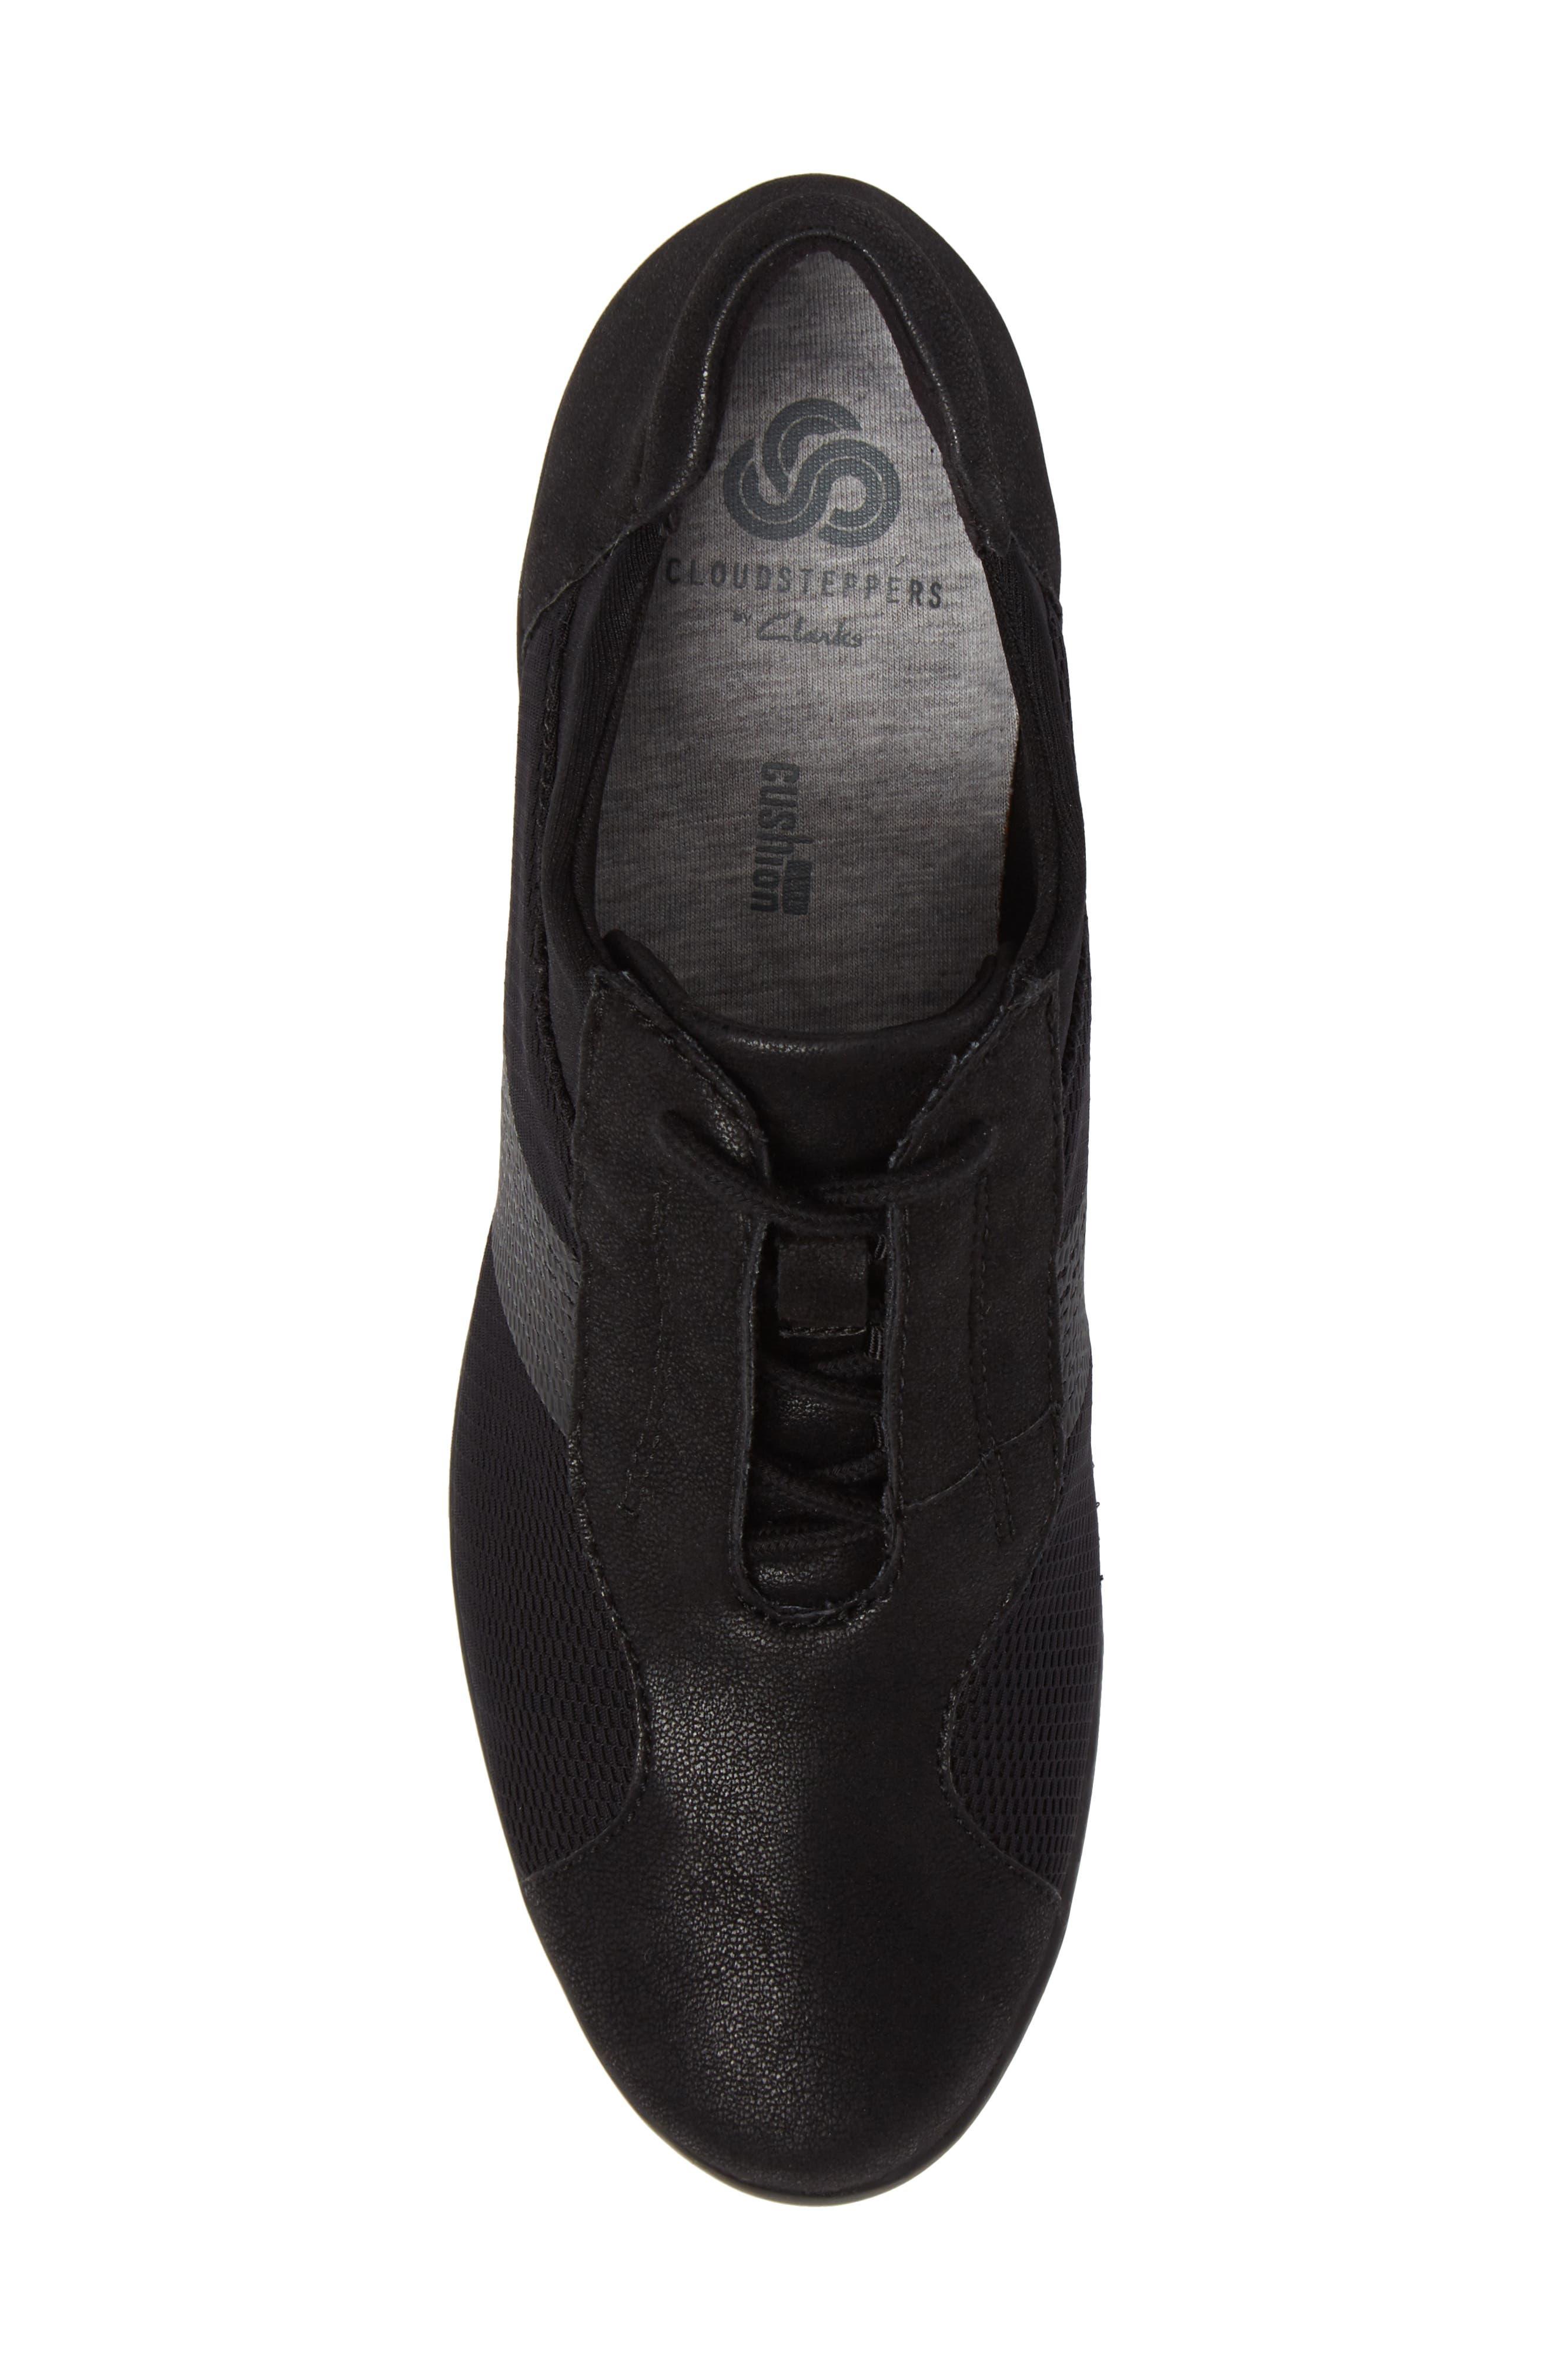 Caddell Fly Sneaker,                             Alternate thumbnail 5, color,                             Black Fabric